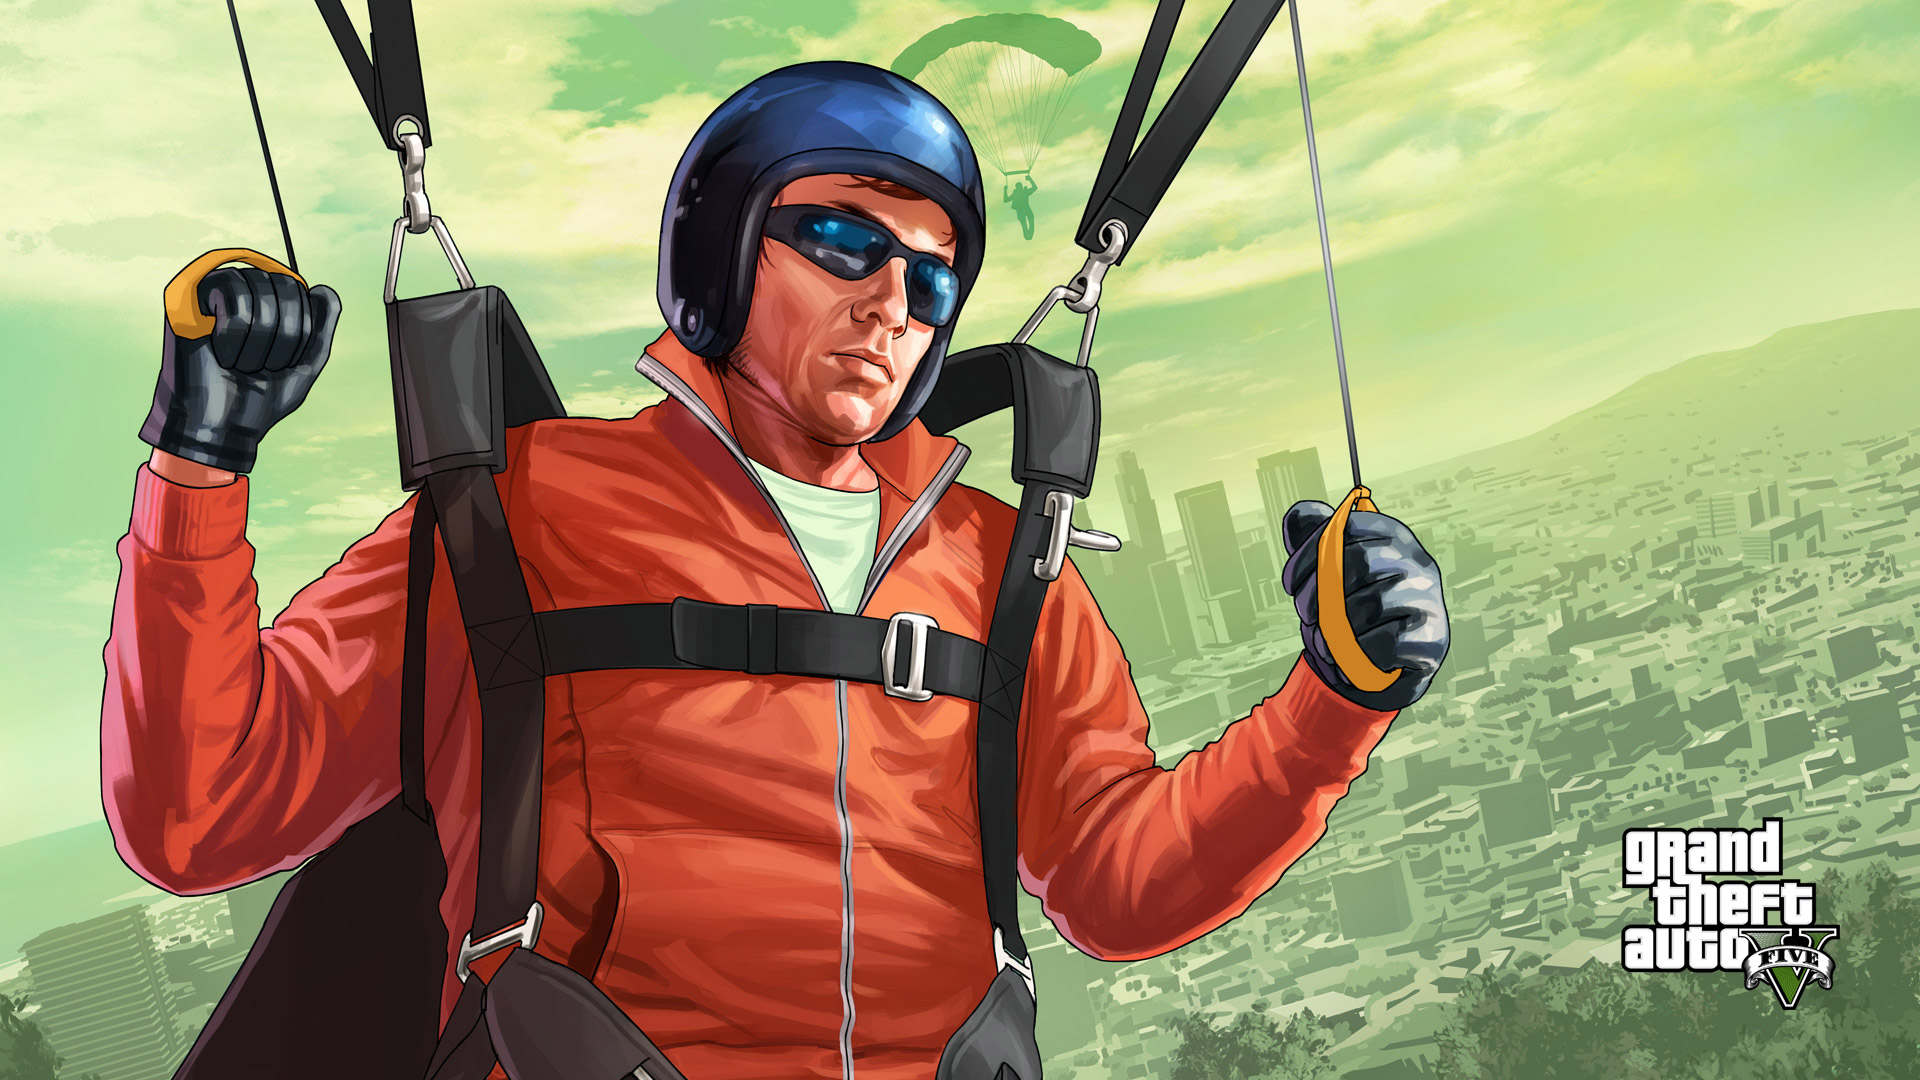 Grand Theft Auto 5 wallpaper 25